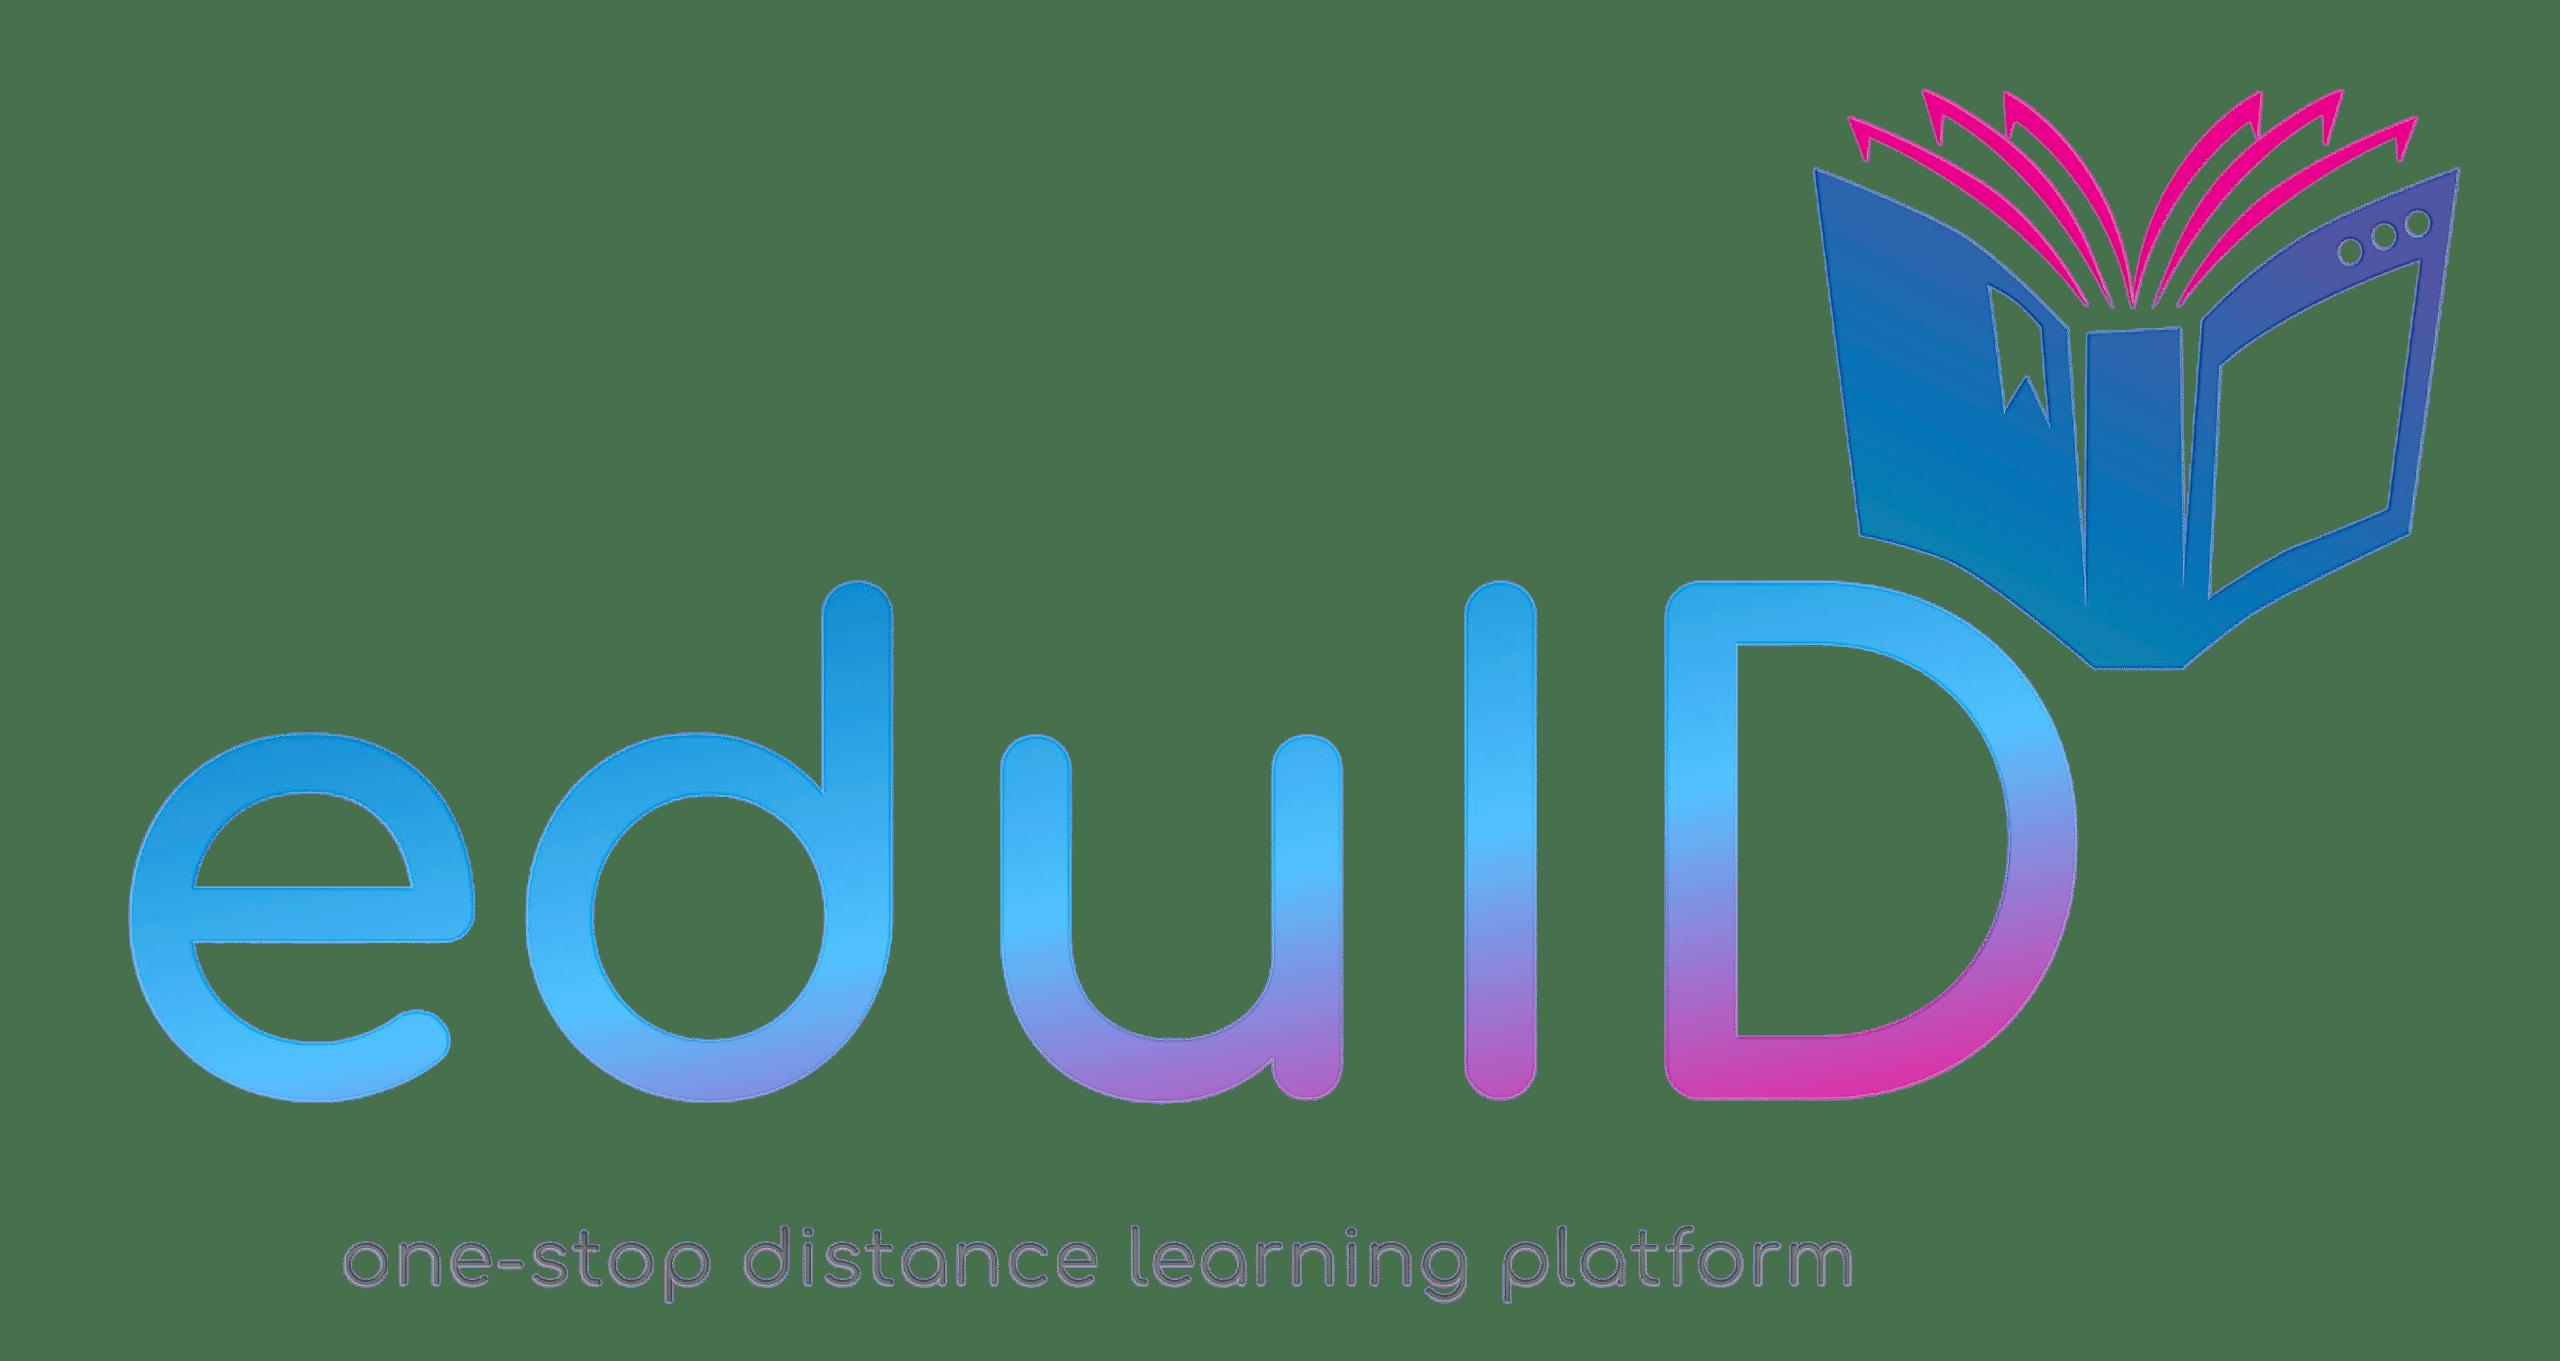 Logo Eduid